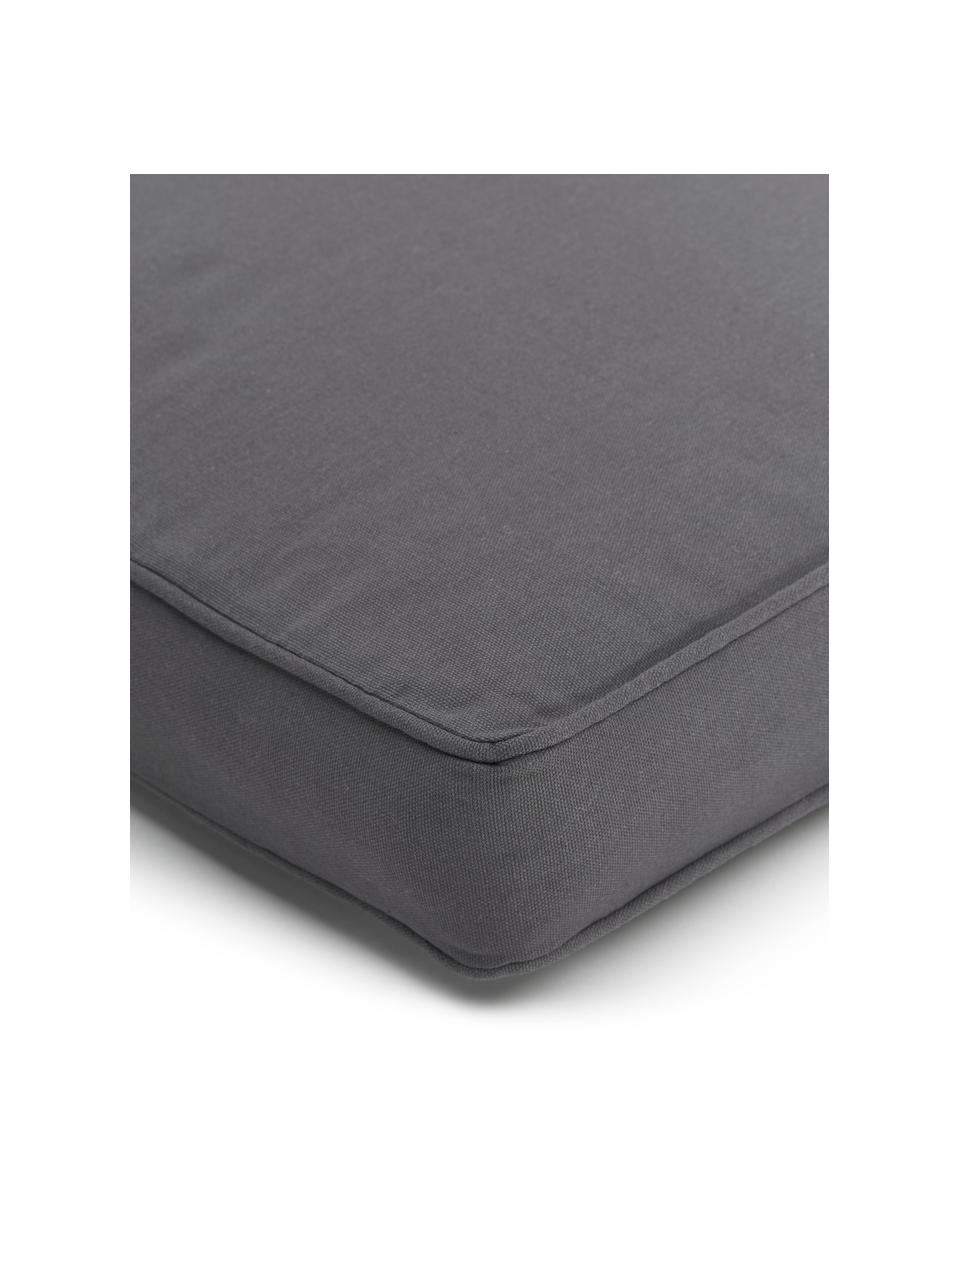 Hohes Sitzkissen Zoey in Dunkelgrau, Bezug: 100% Baumwolle, Grau, 40 x 40 cm